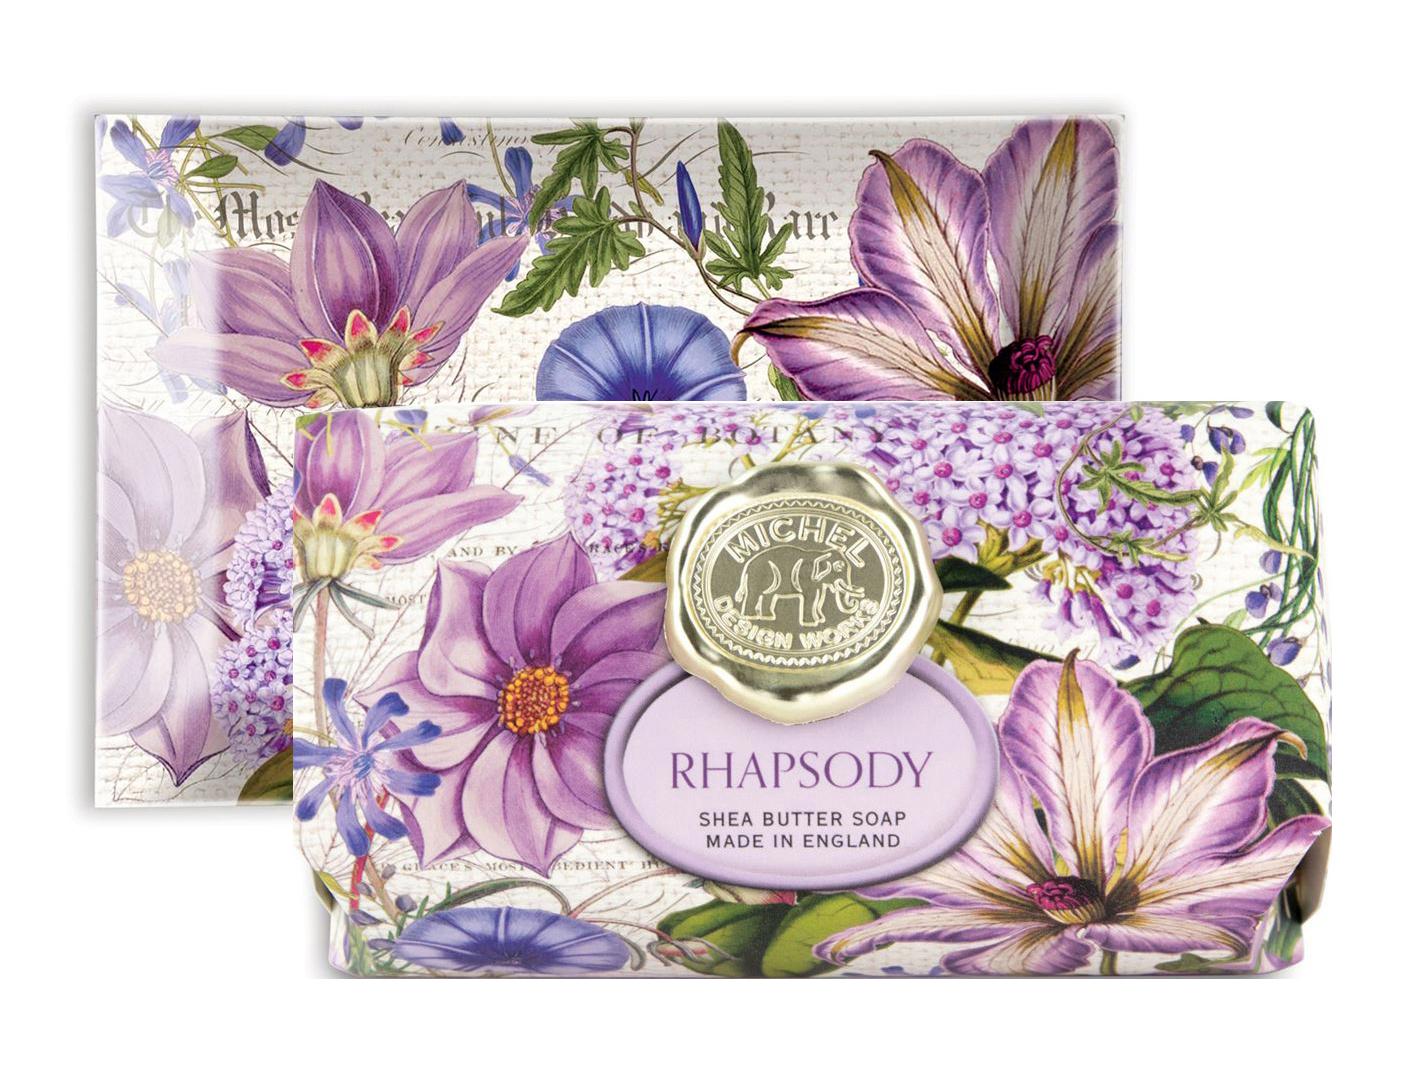 Michel hostess gifts - decorative soaps, foaming soaps, napkins, aprons